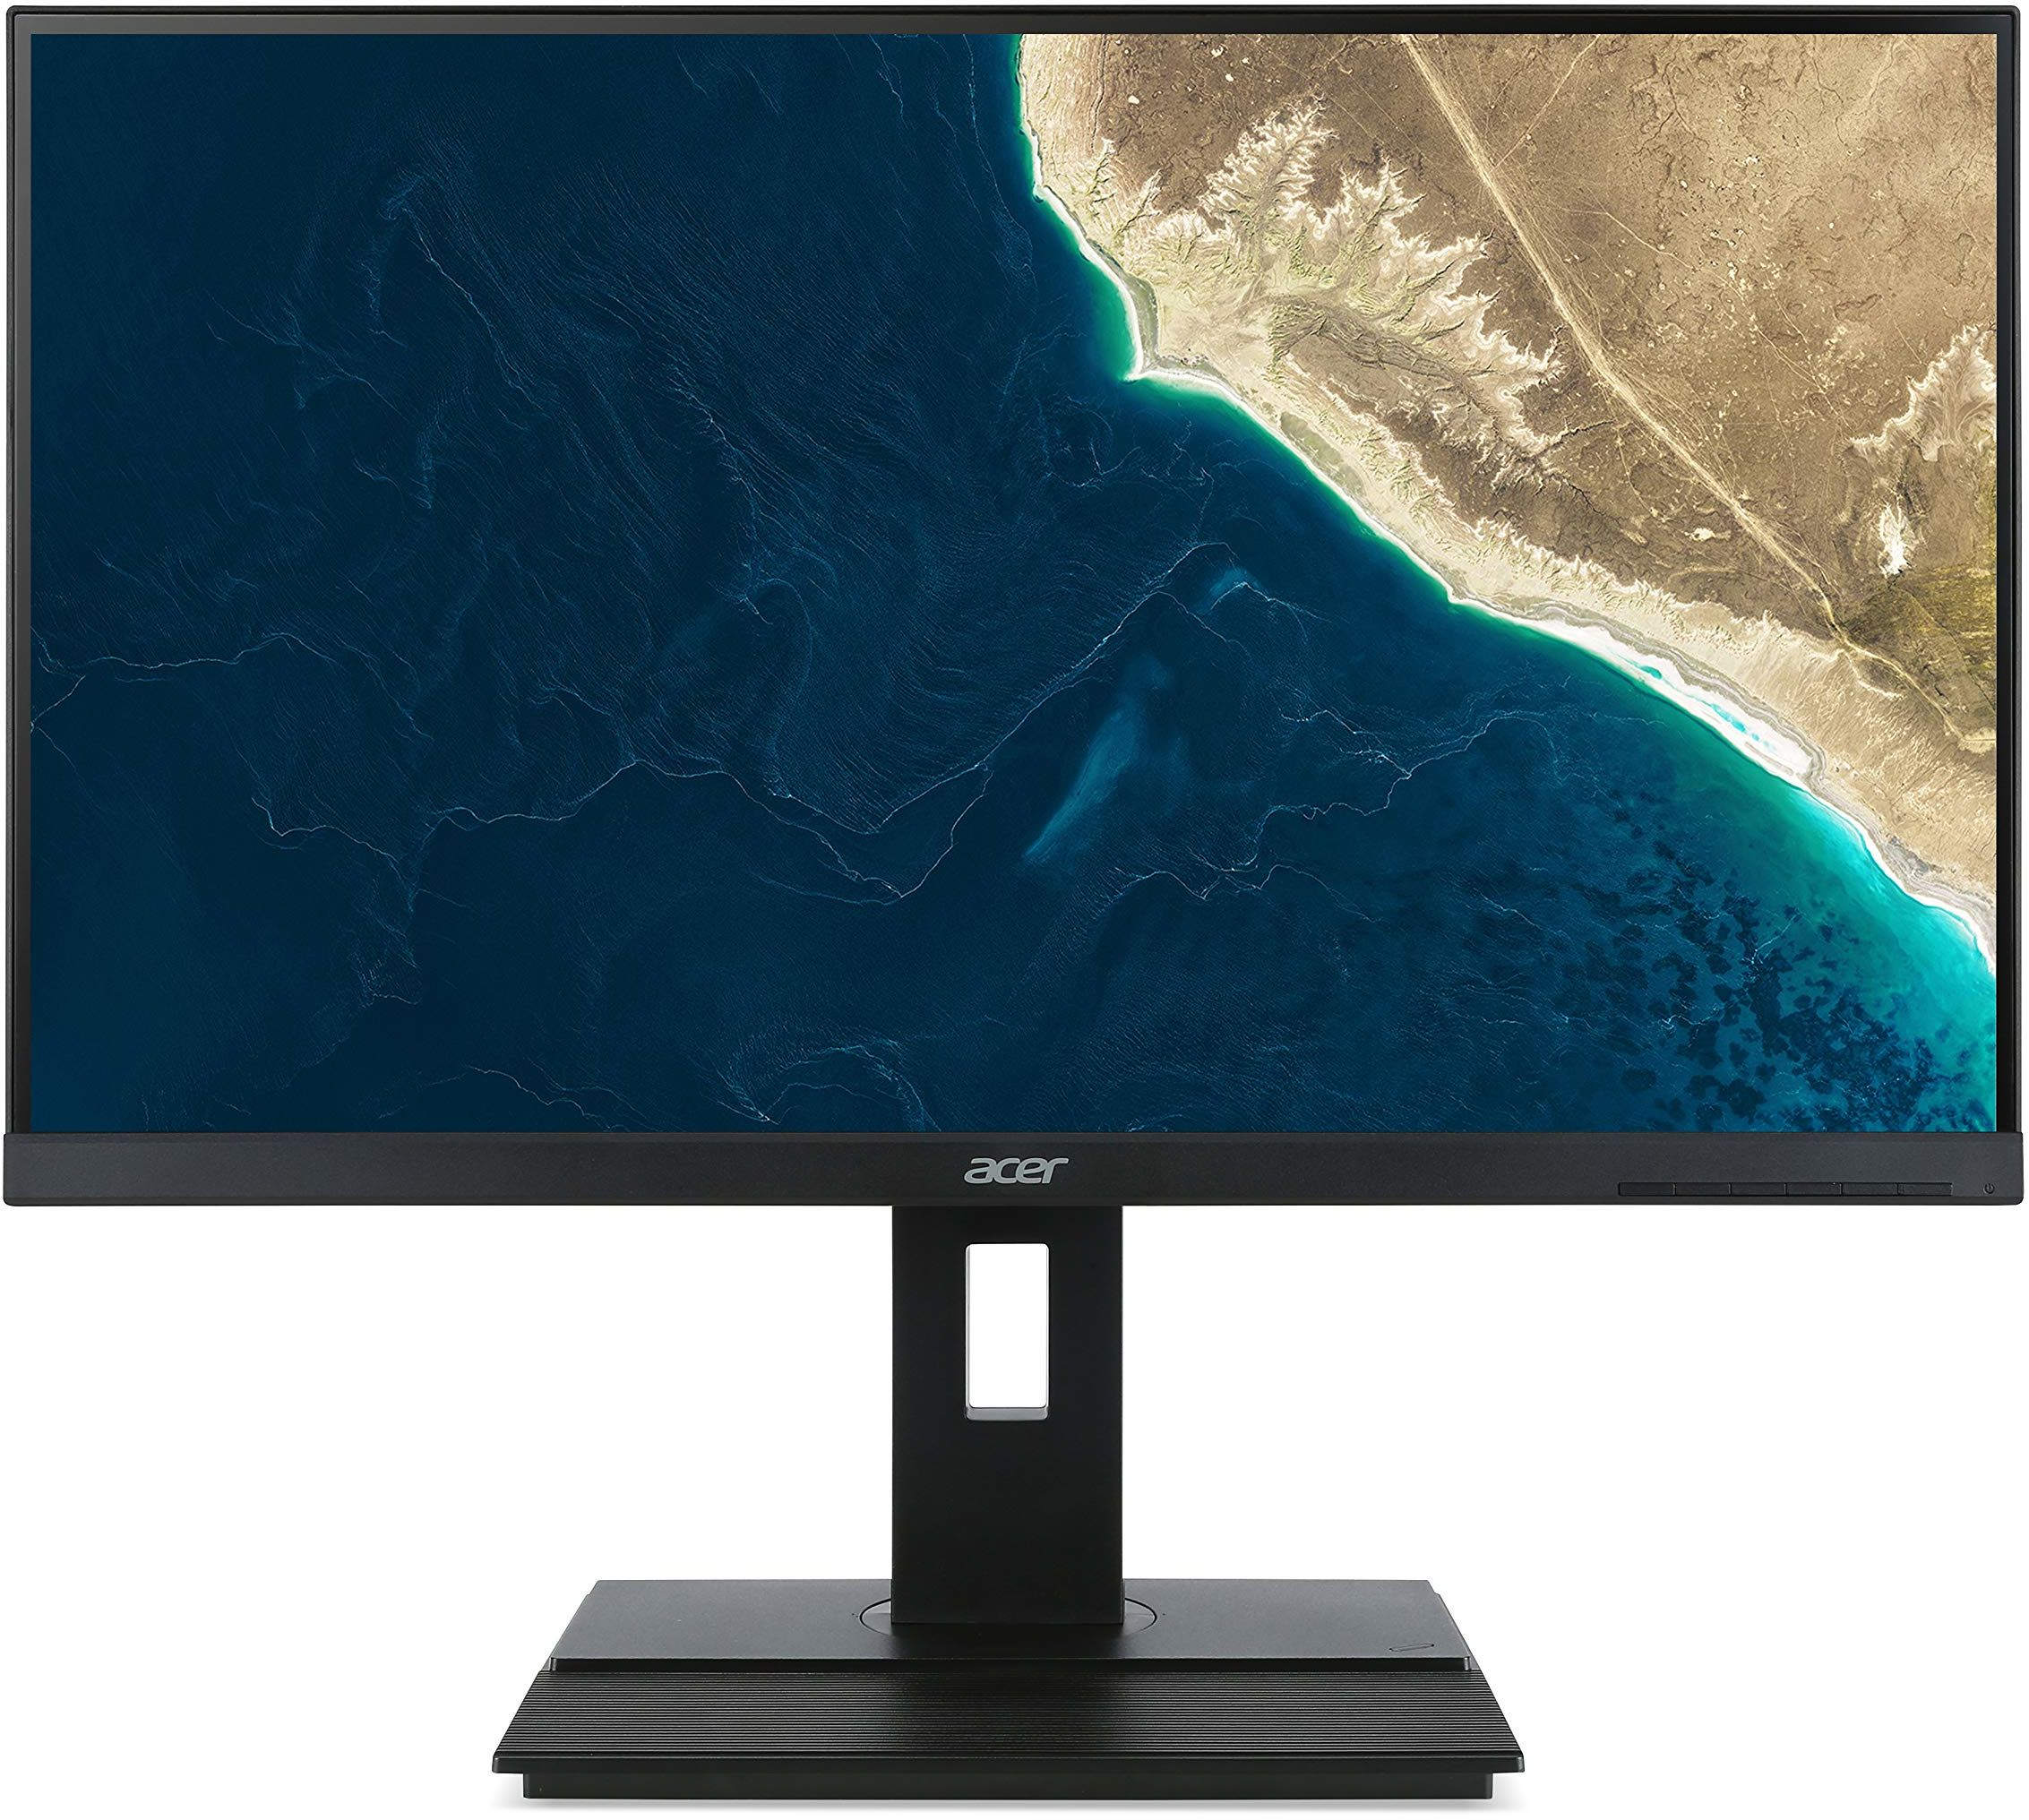 ACER B276HULEymiipruzx 68,6 cm 27 cali TFT LED DVI 2xHDMI 2.0 Mini DP USB 3.0 Hub USB3.1 typ C 100M:1 350cd/m  5ms ciemnoszary